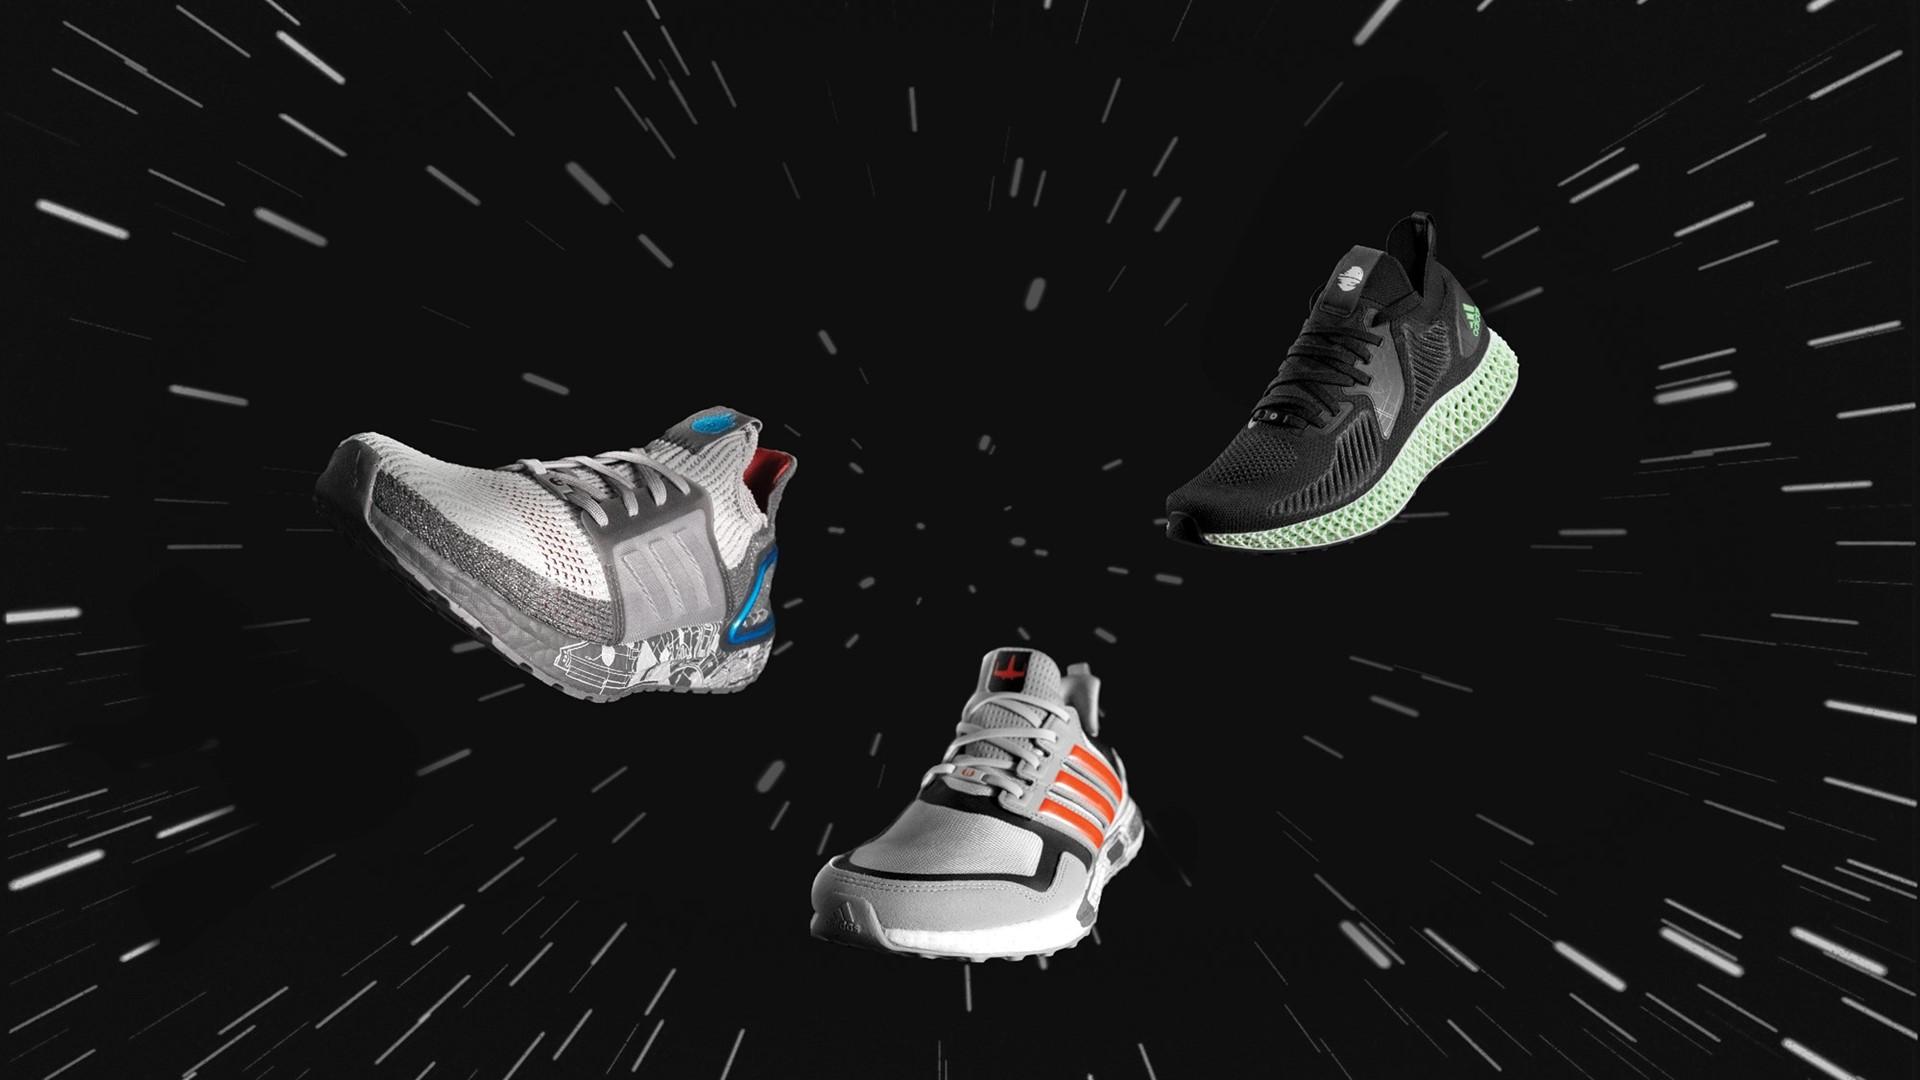 adidas Reveals the Second Installment of their 2019